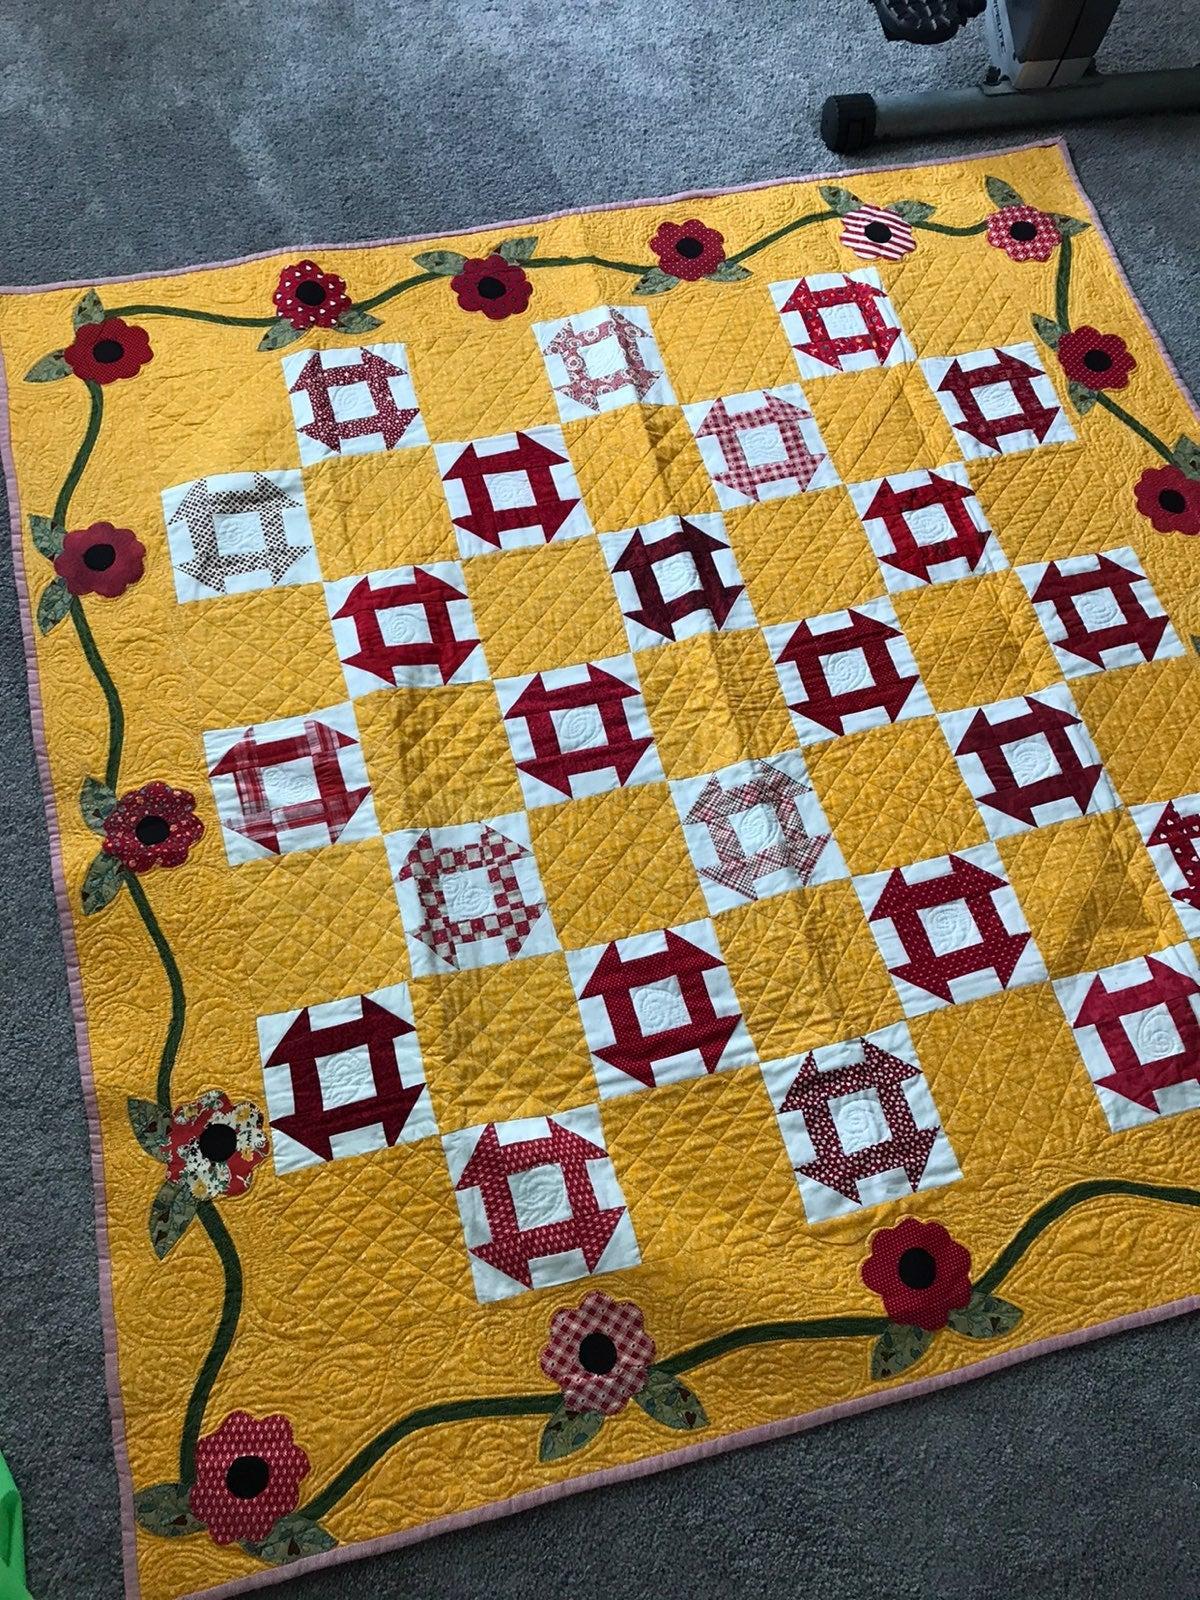 Churn Dash quilt hand crafted